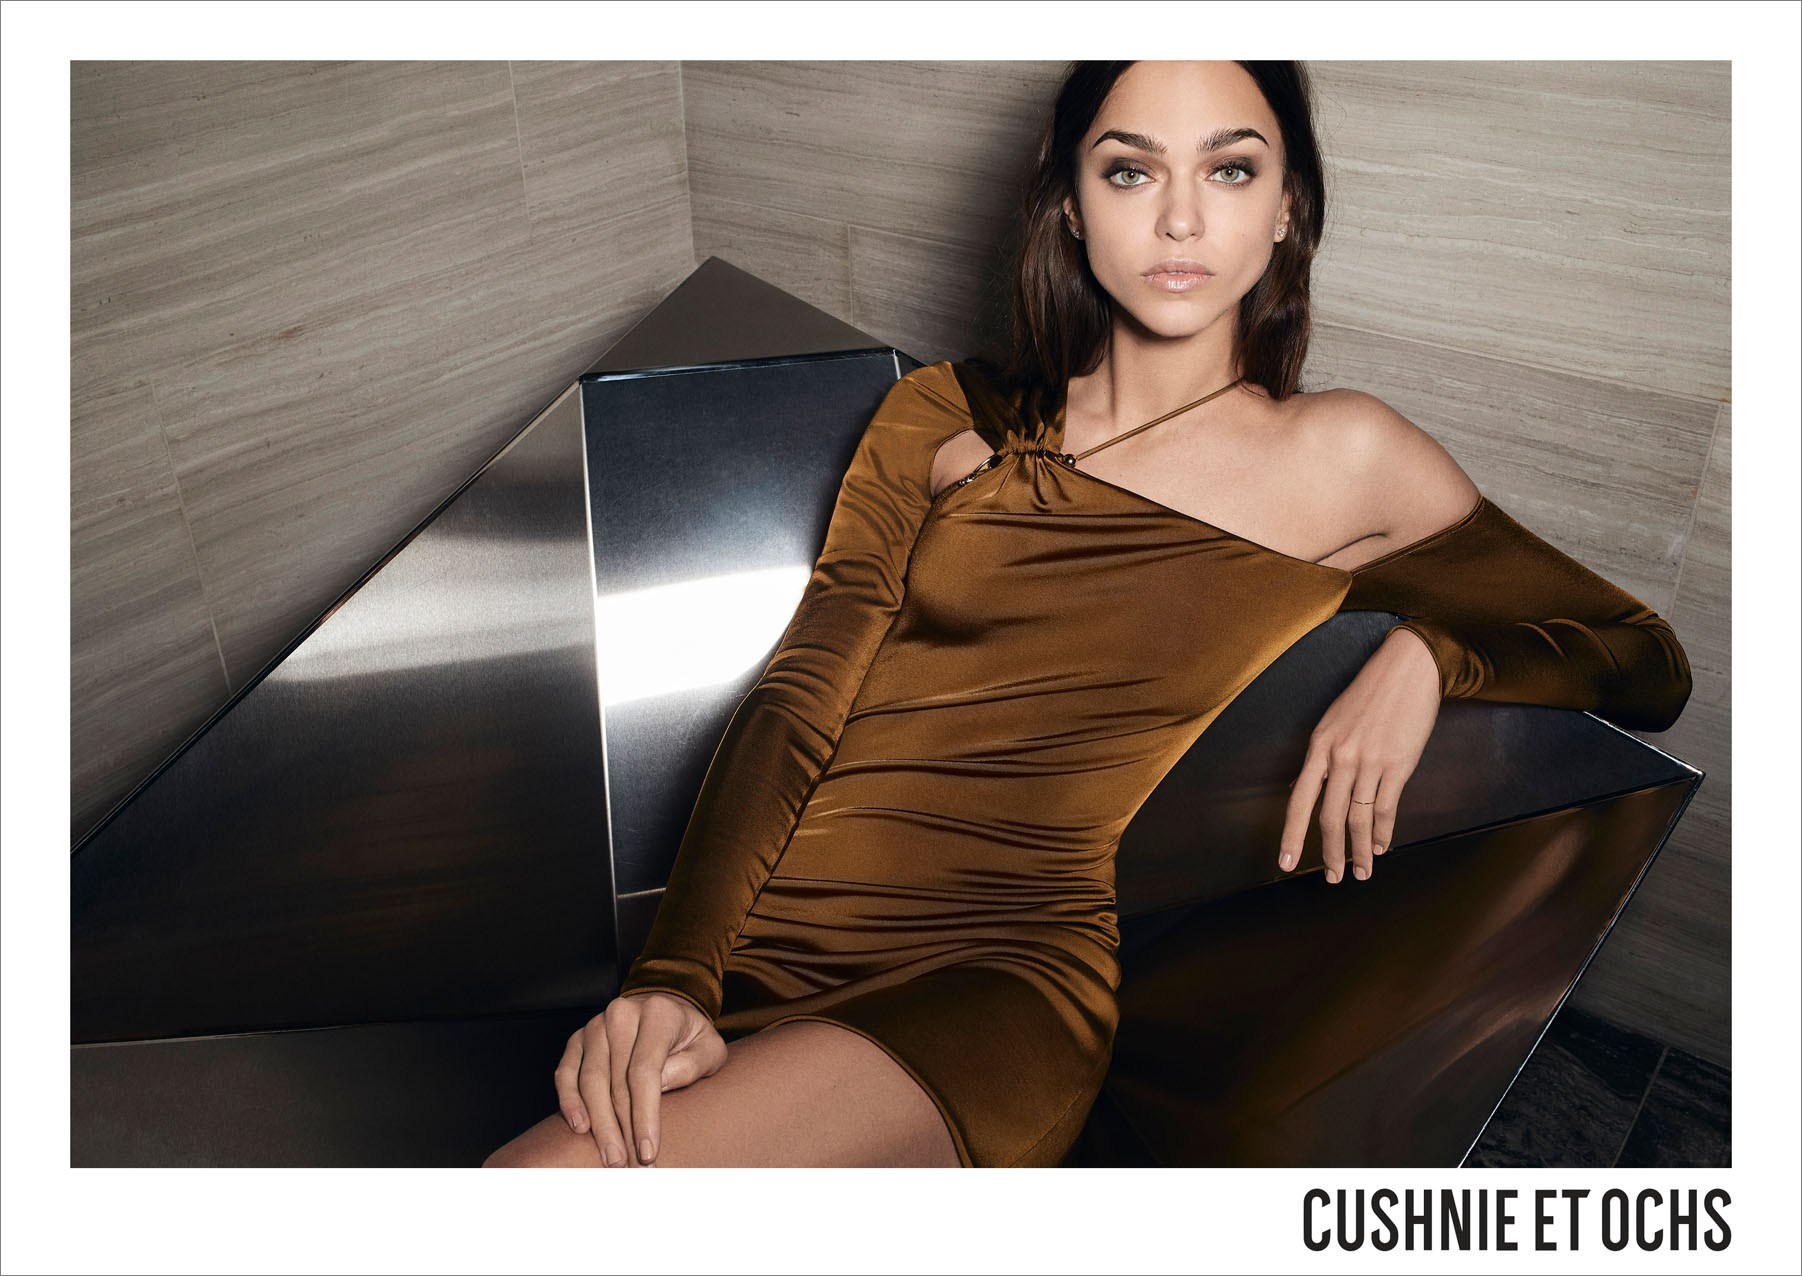 Cushnie-et-Ochs-resort-2018-ad-campaign-the-impression-06